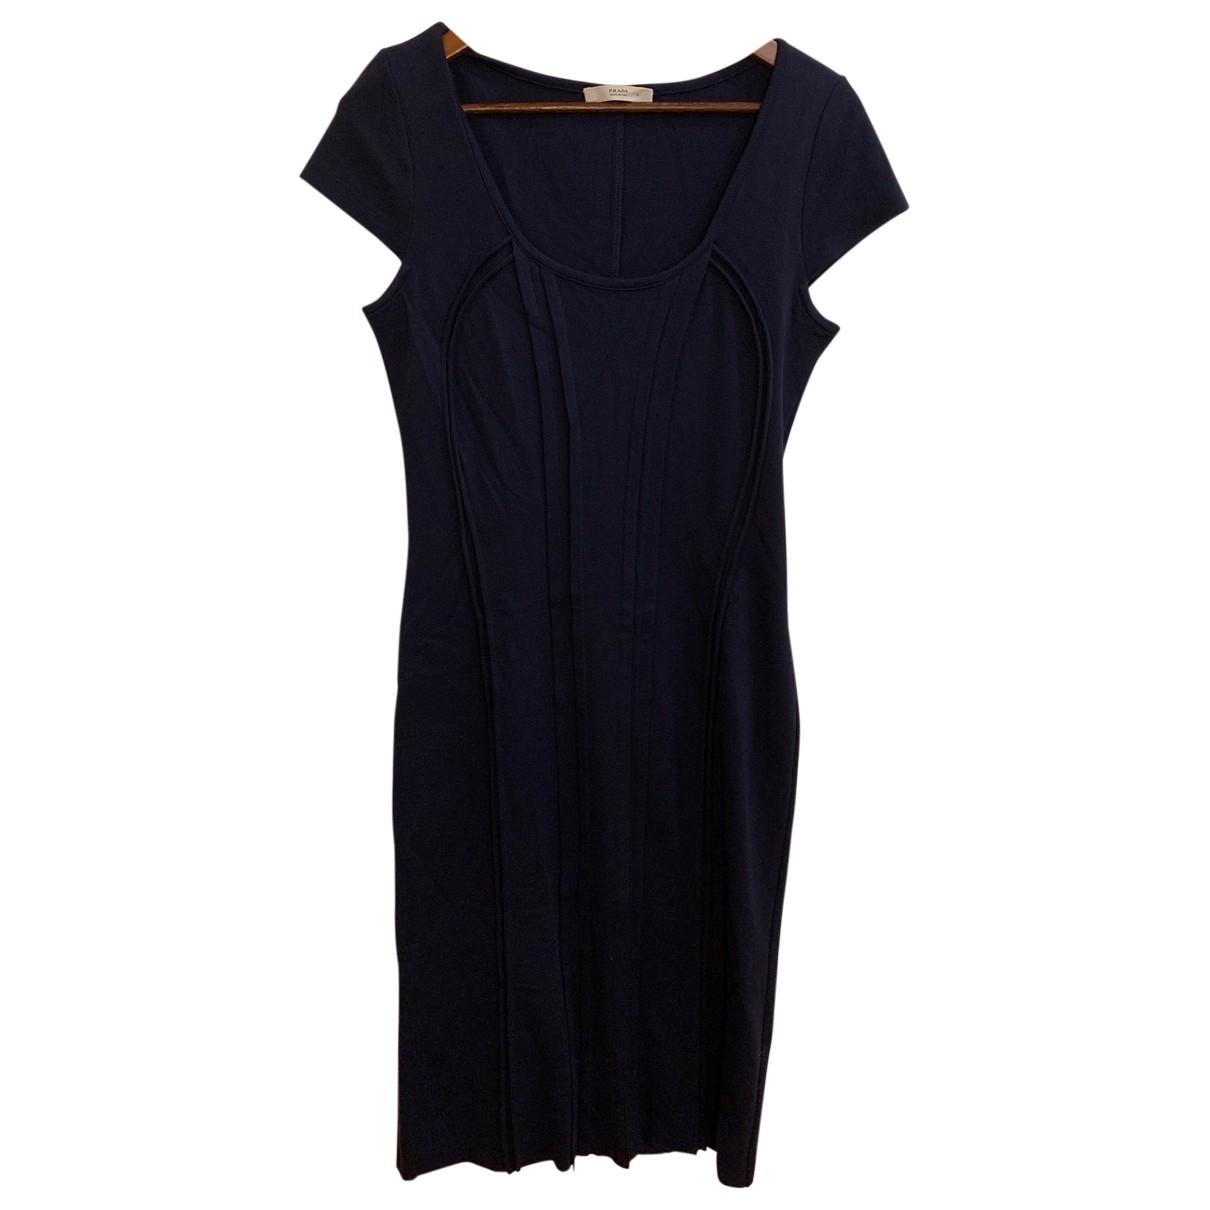 Prada \N Blue Cotton dress for Women L International